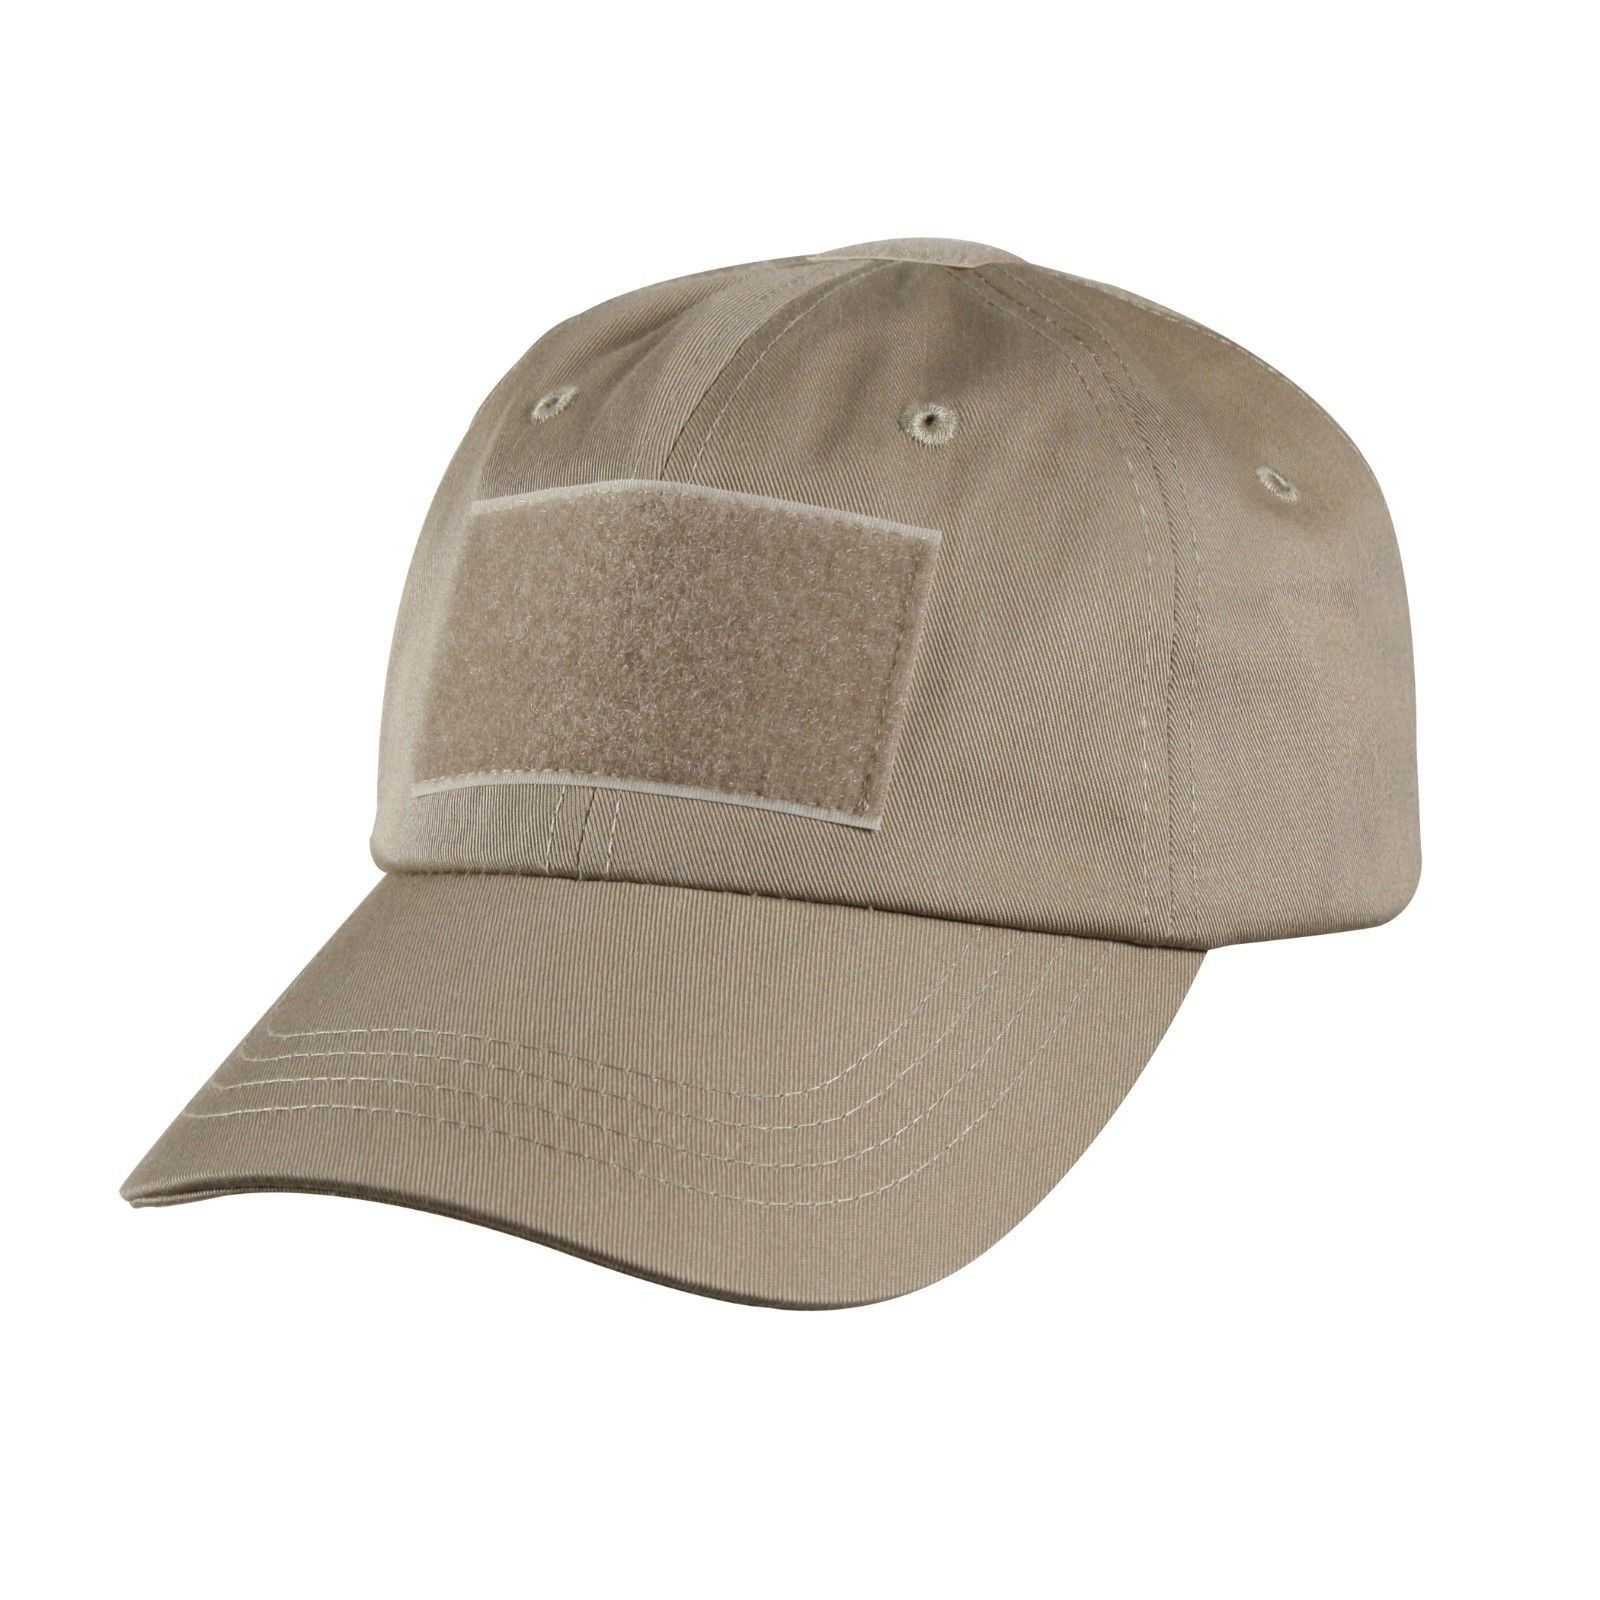 Tactical Operator Casquette Avec Drapeau Américain Baseball Hat Rothco